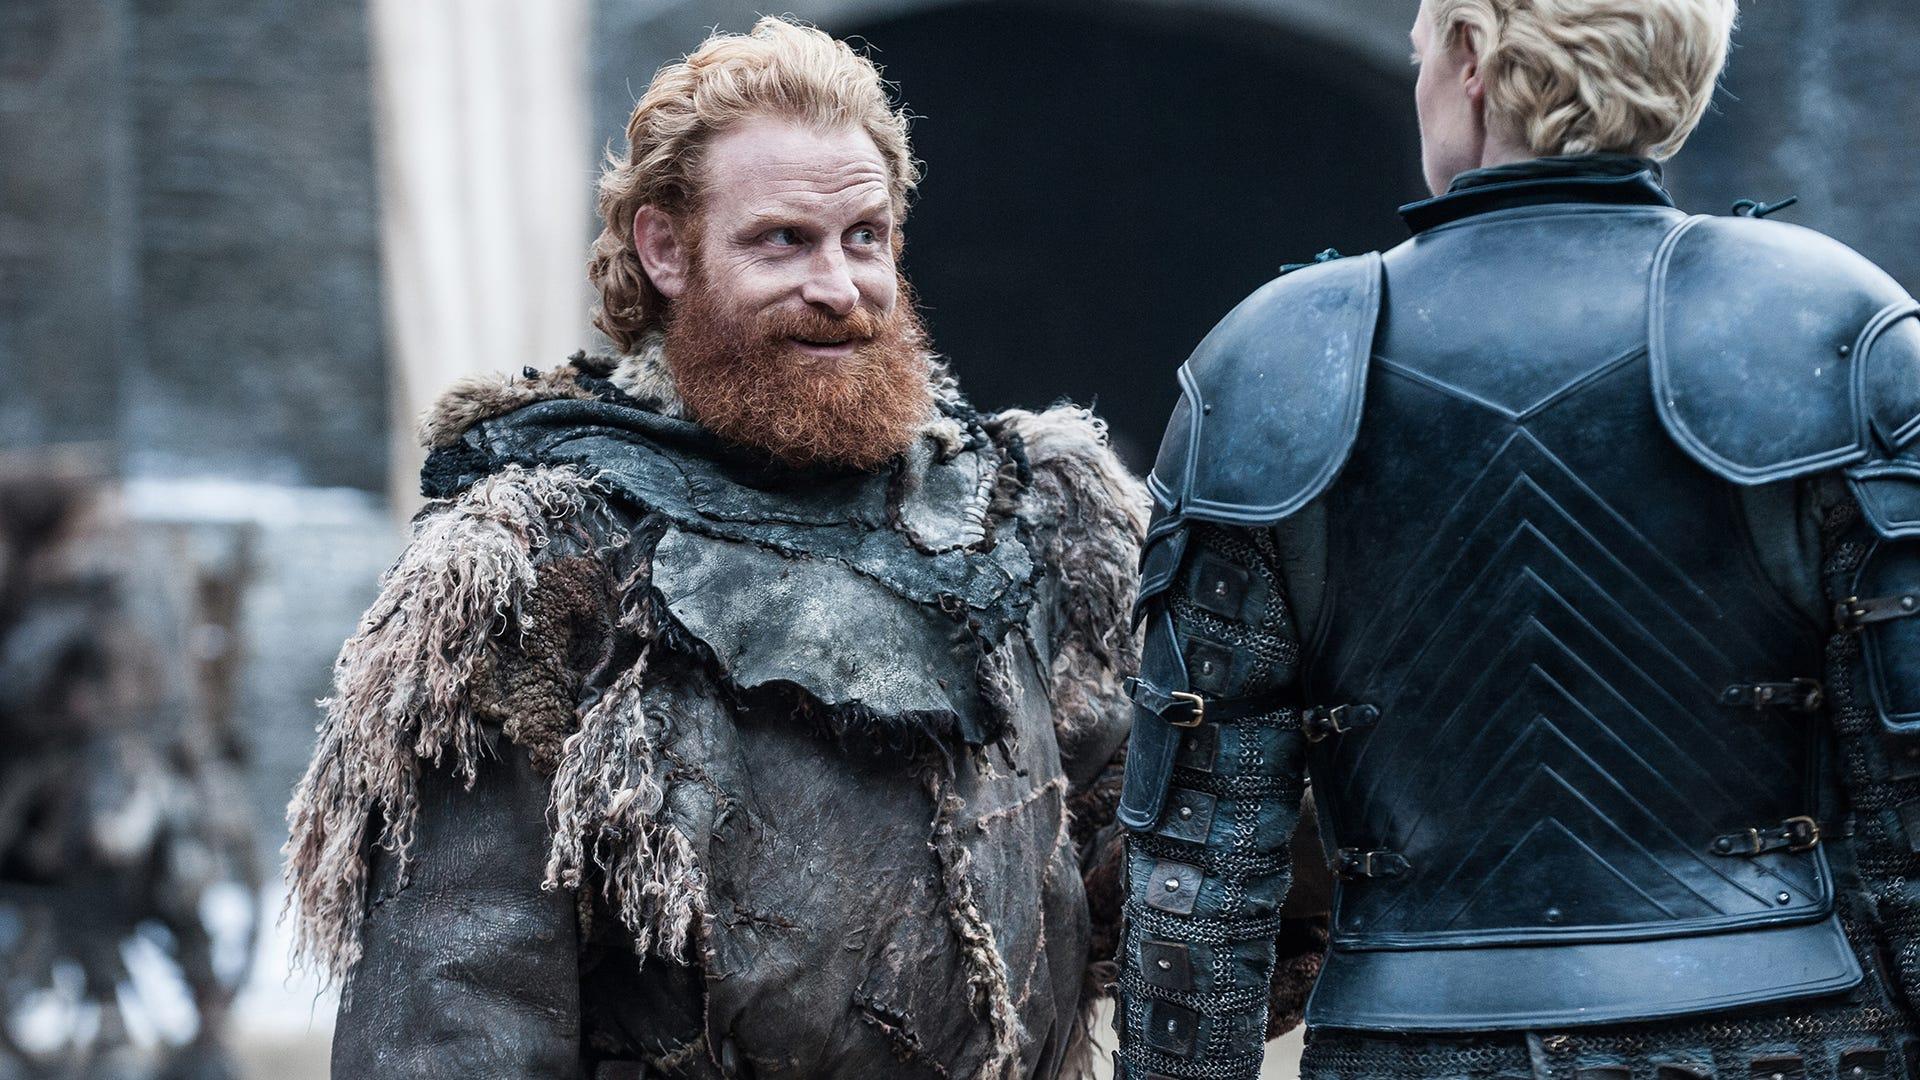 Kristofer Hivju, Gwendoline Christie; Game of Thrones